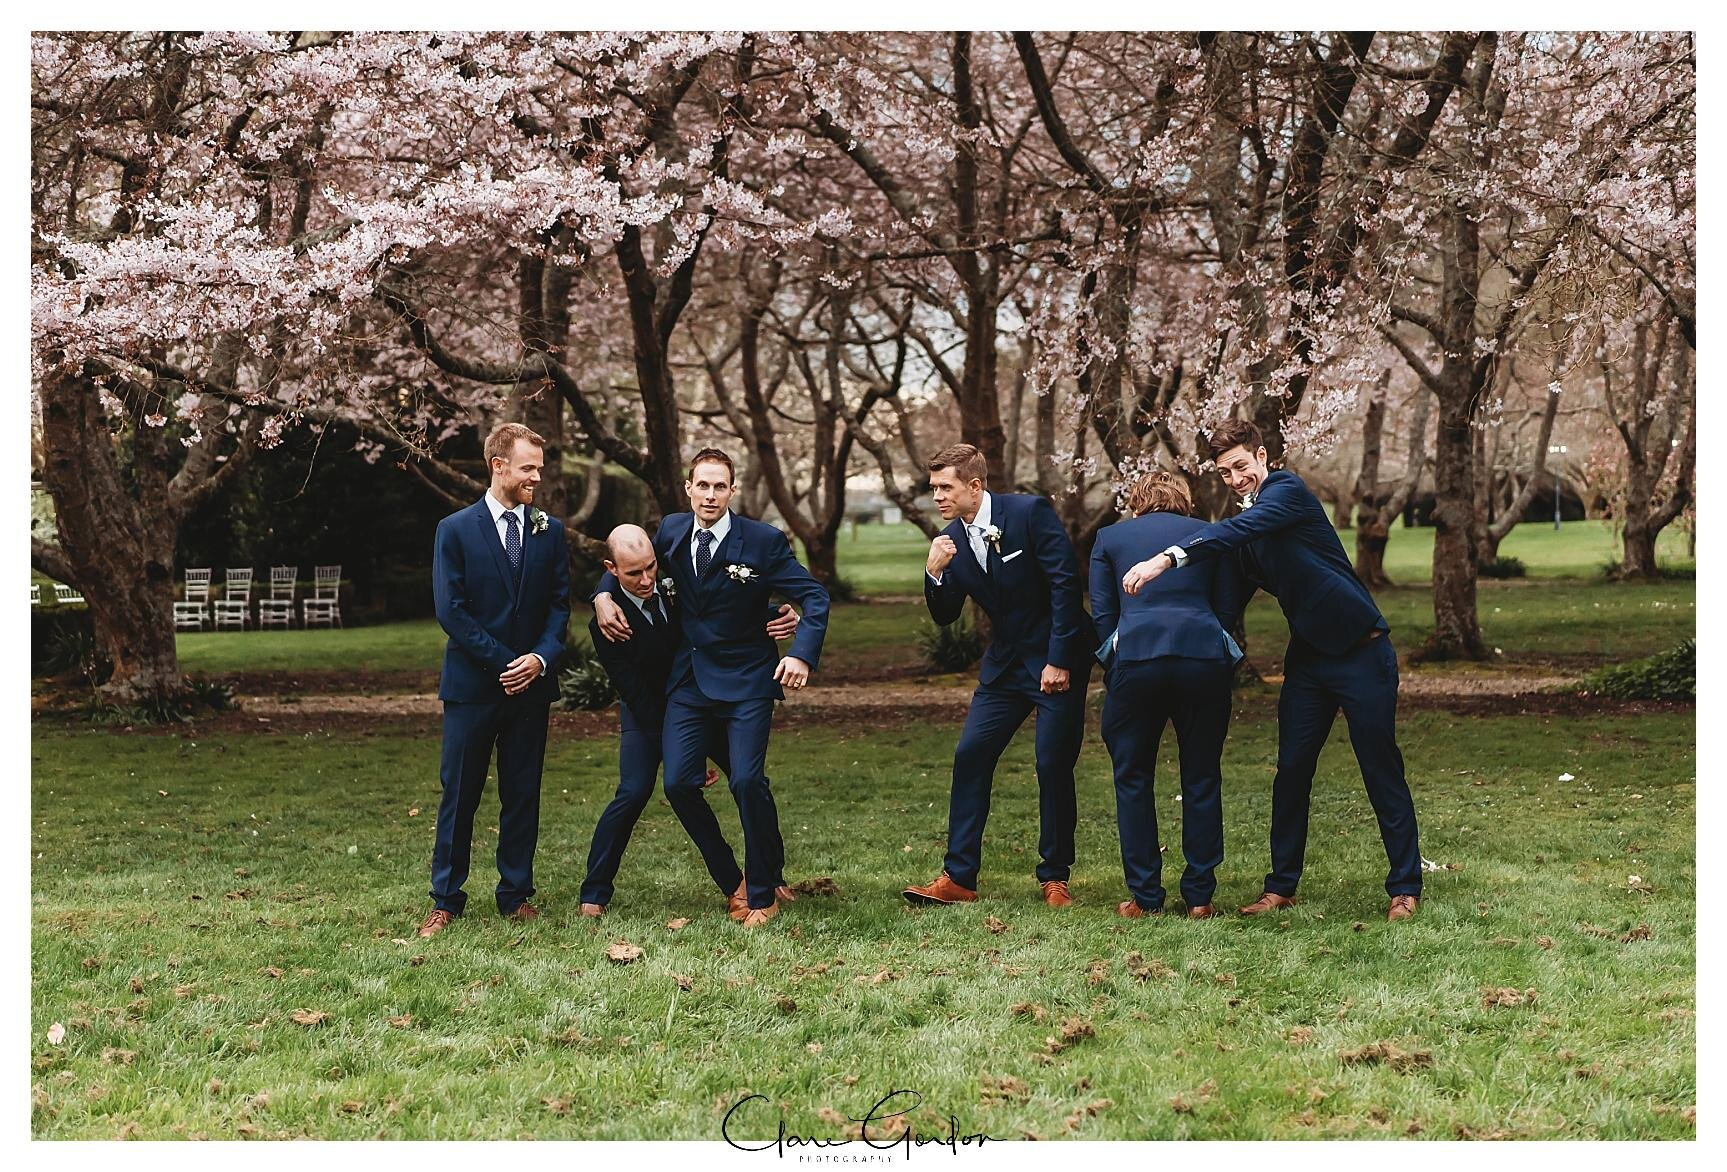 Henley-Hotel-Cherry-blossom-wedding-photos (69).jpg